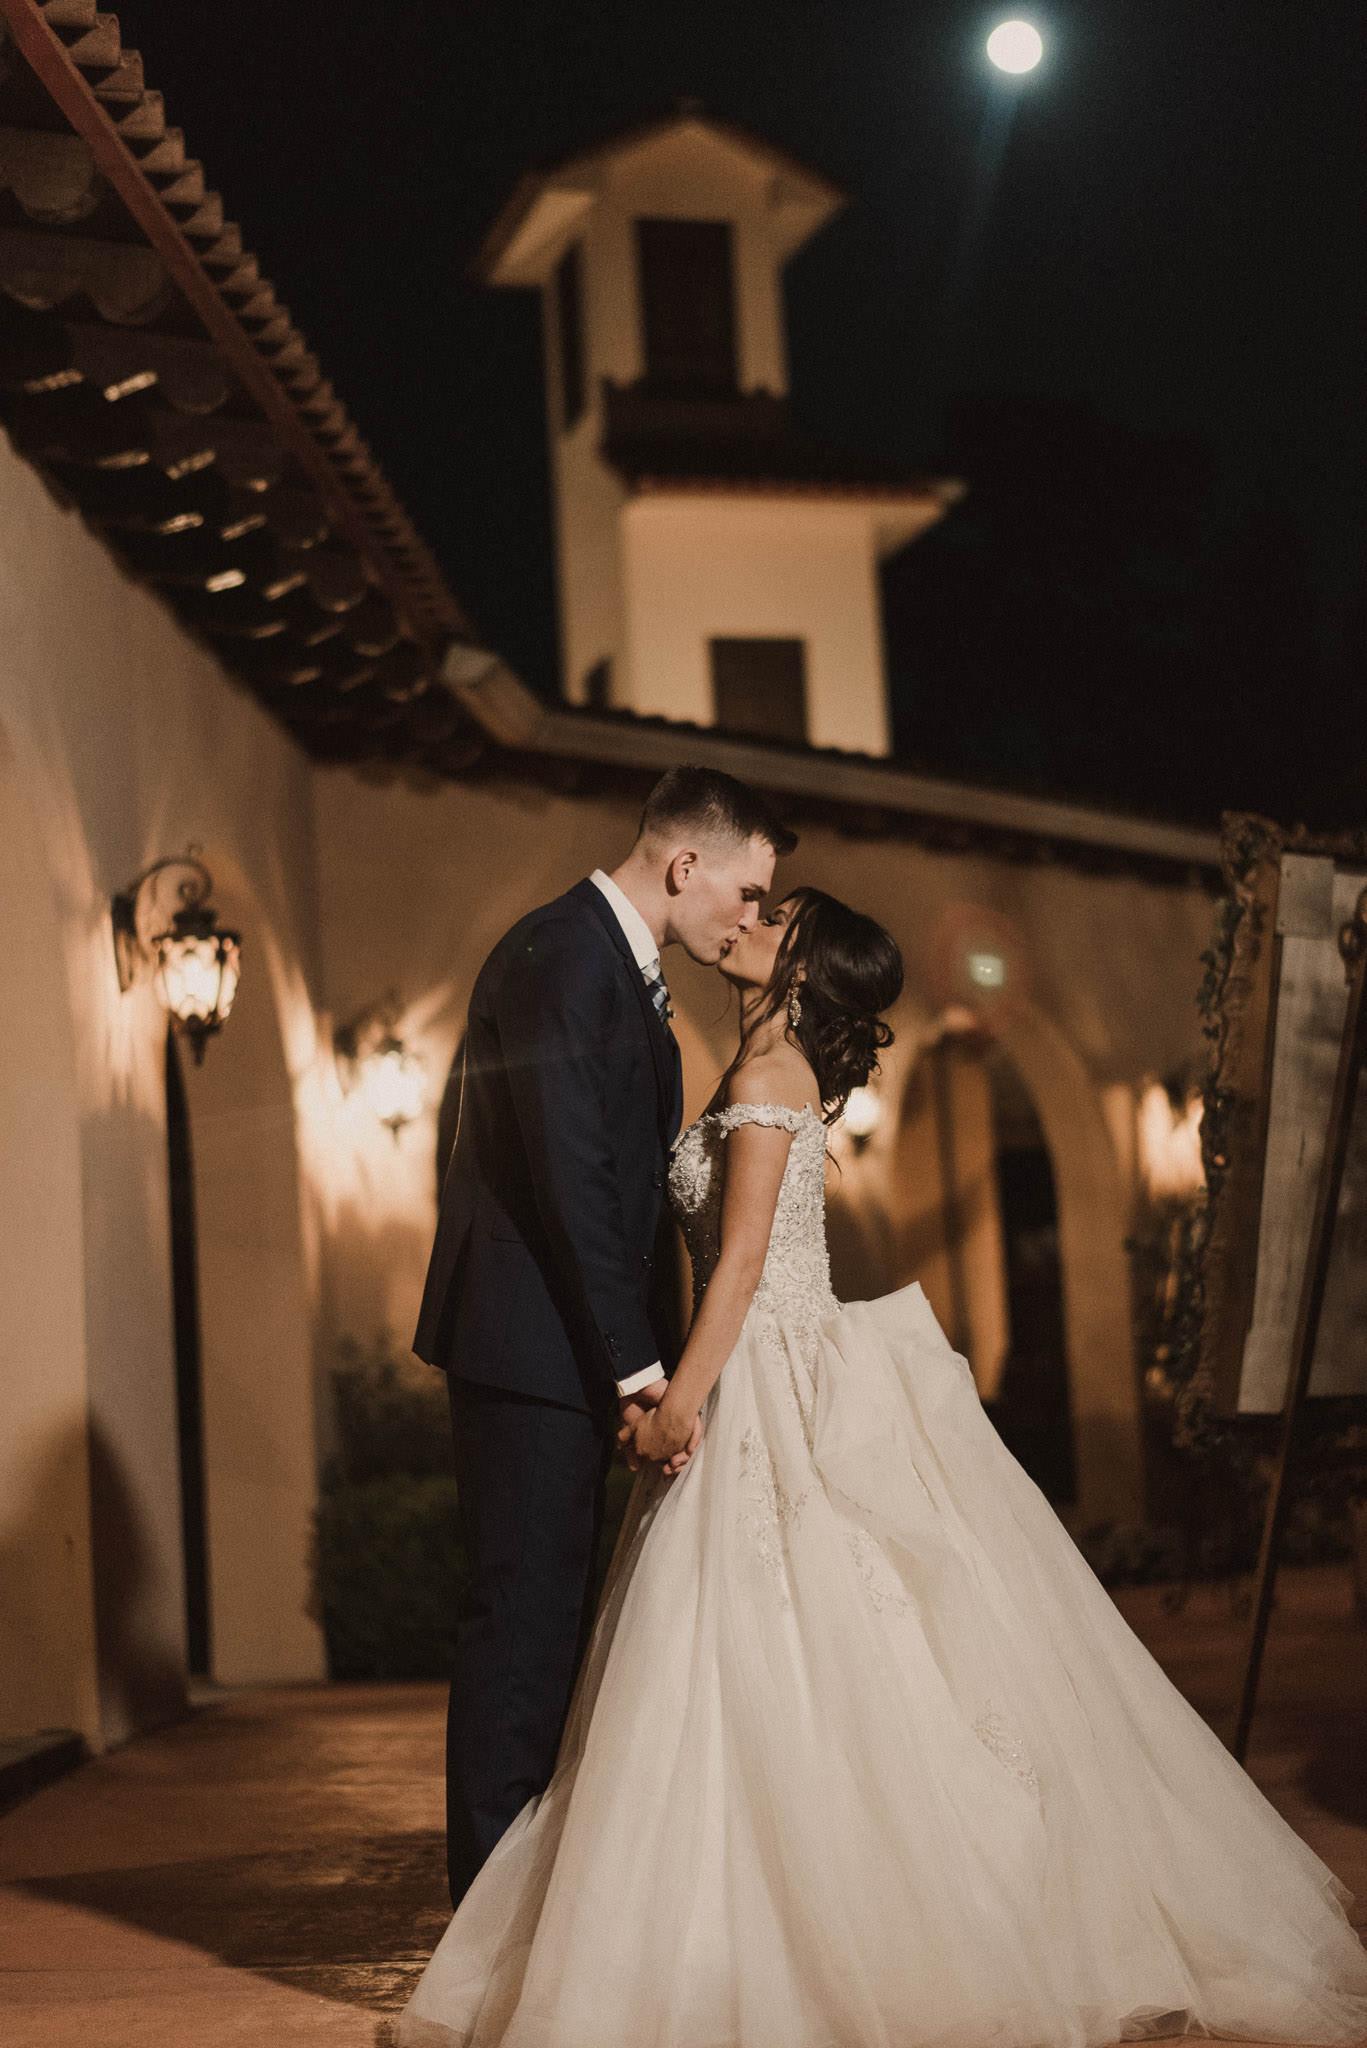 adriana-christian-wedding-re-sm-159.jpg